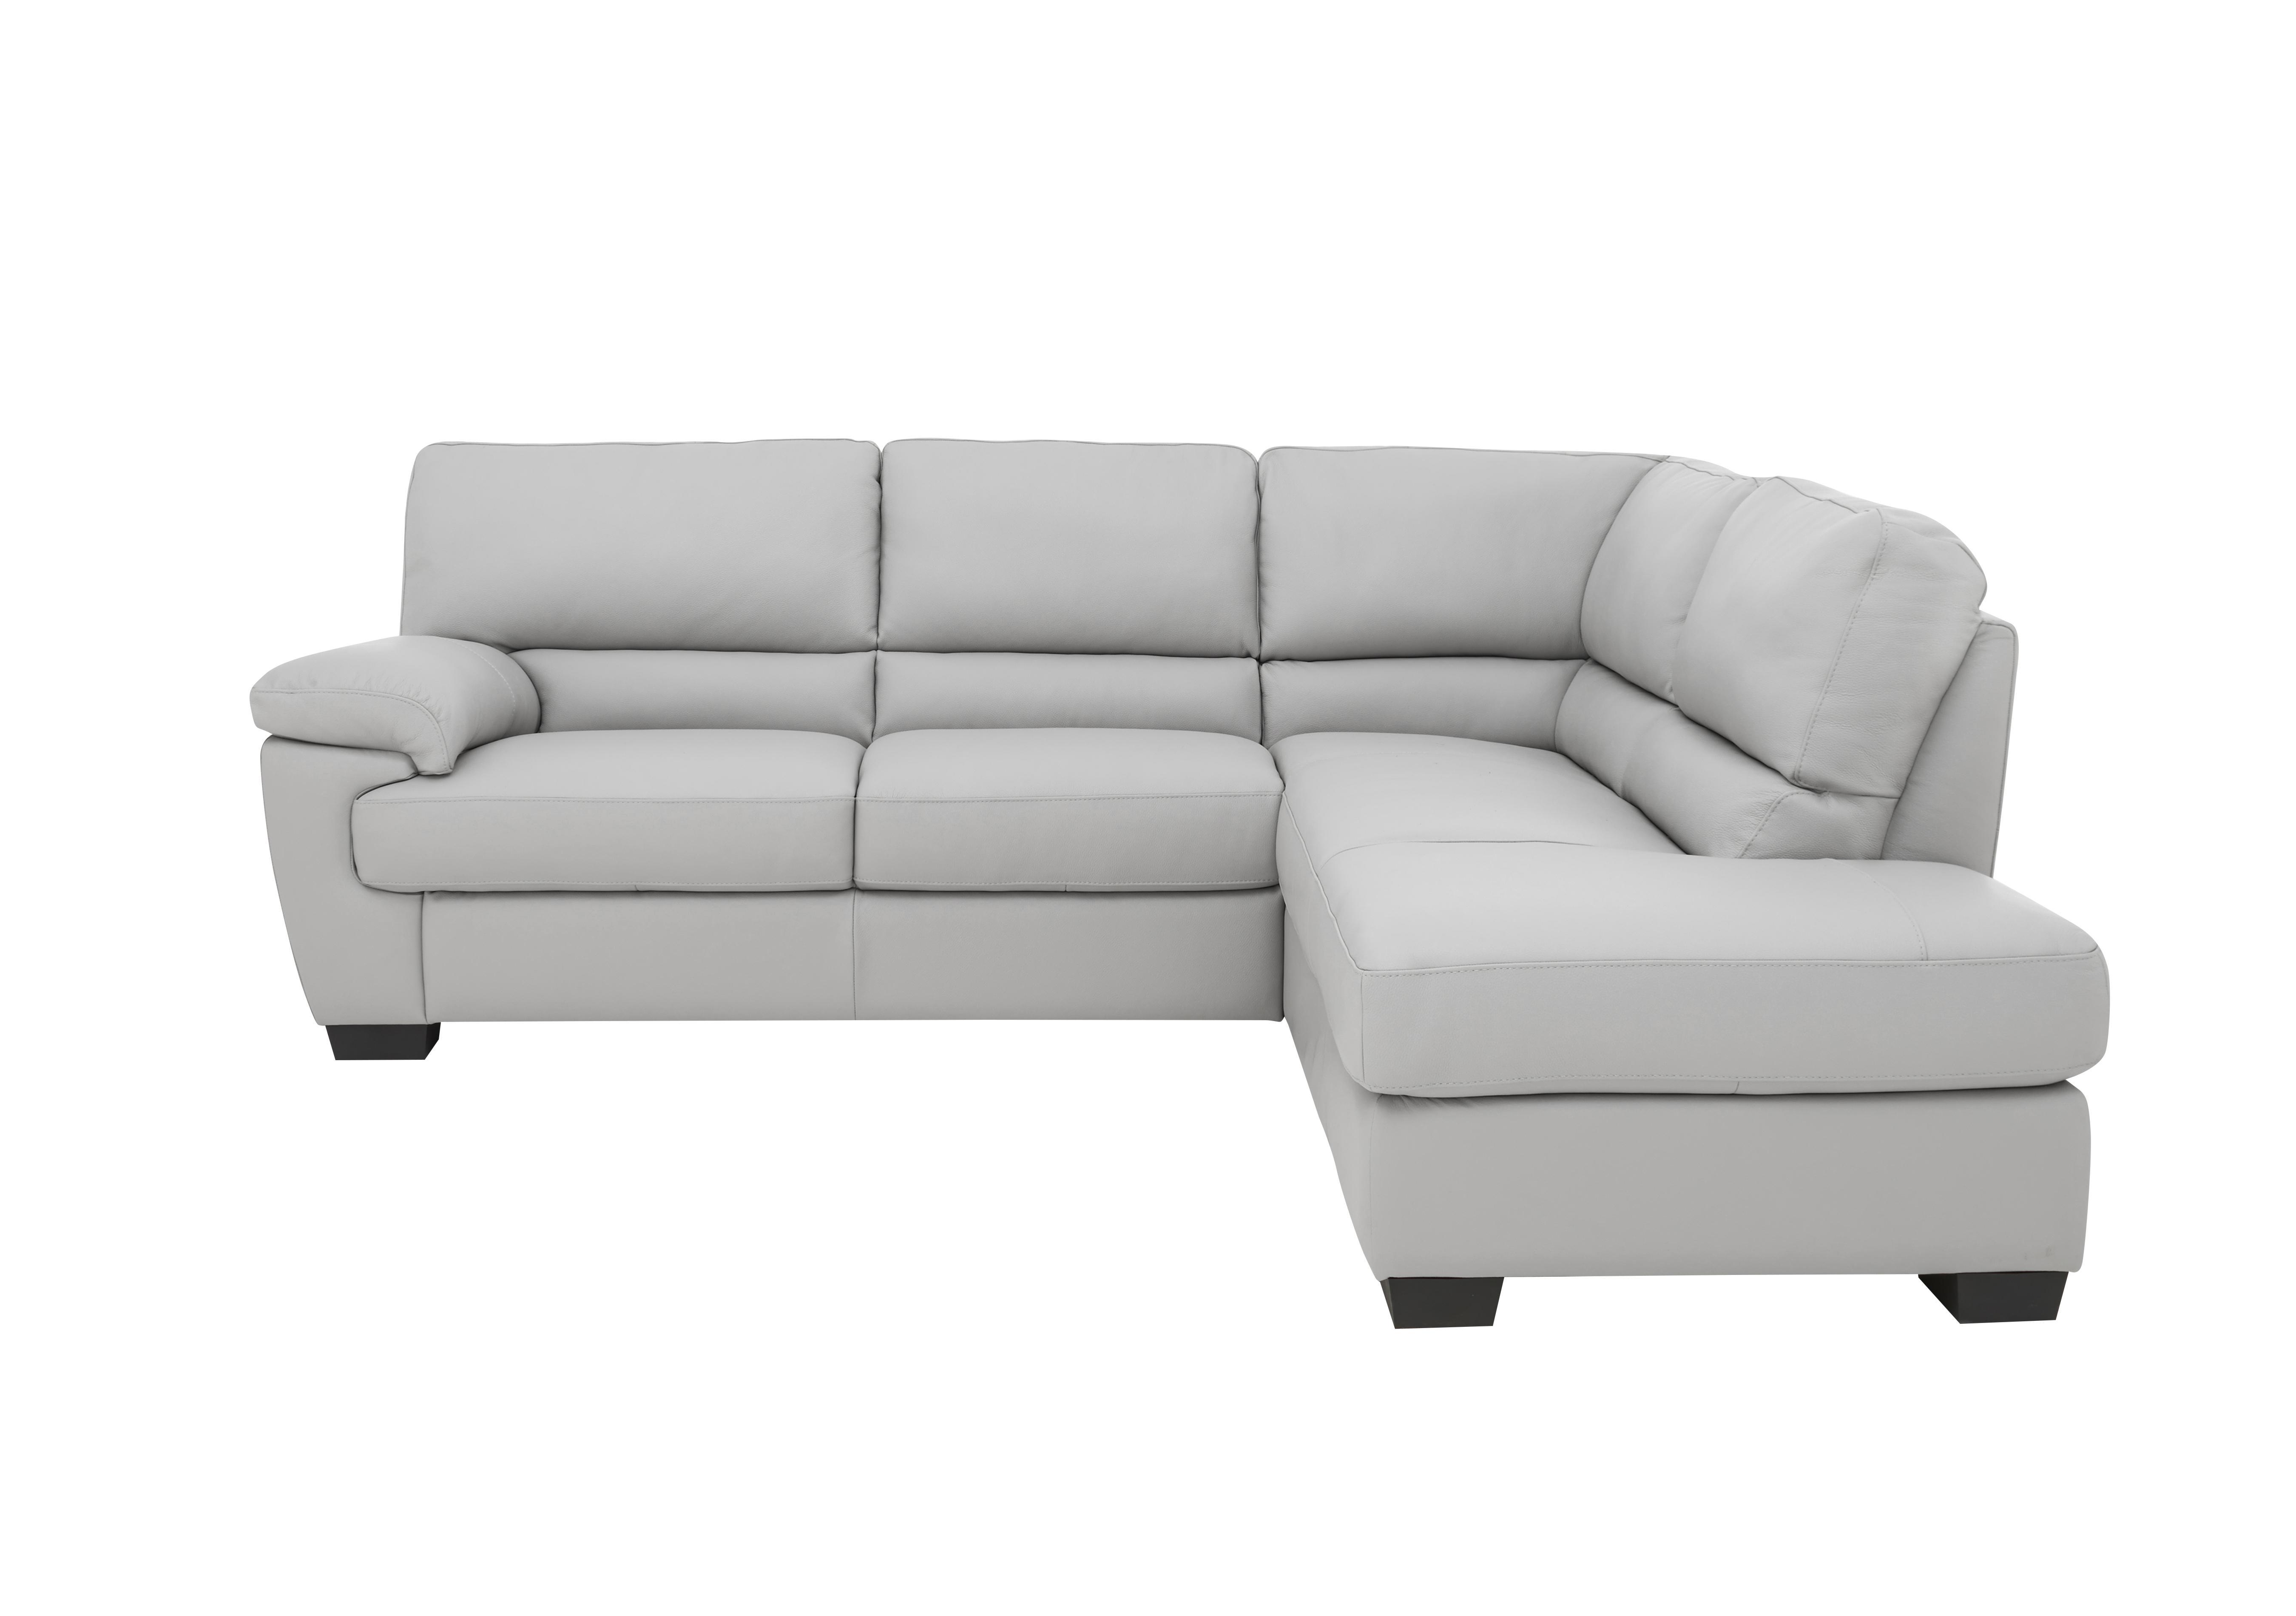 Extra 20% off - use code TREAT20. Lazio Leather Corner Sofa